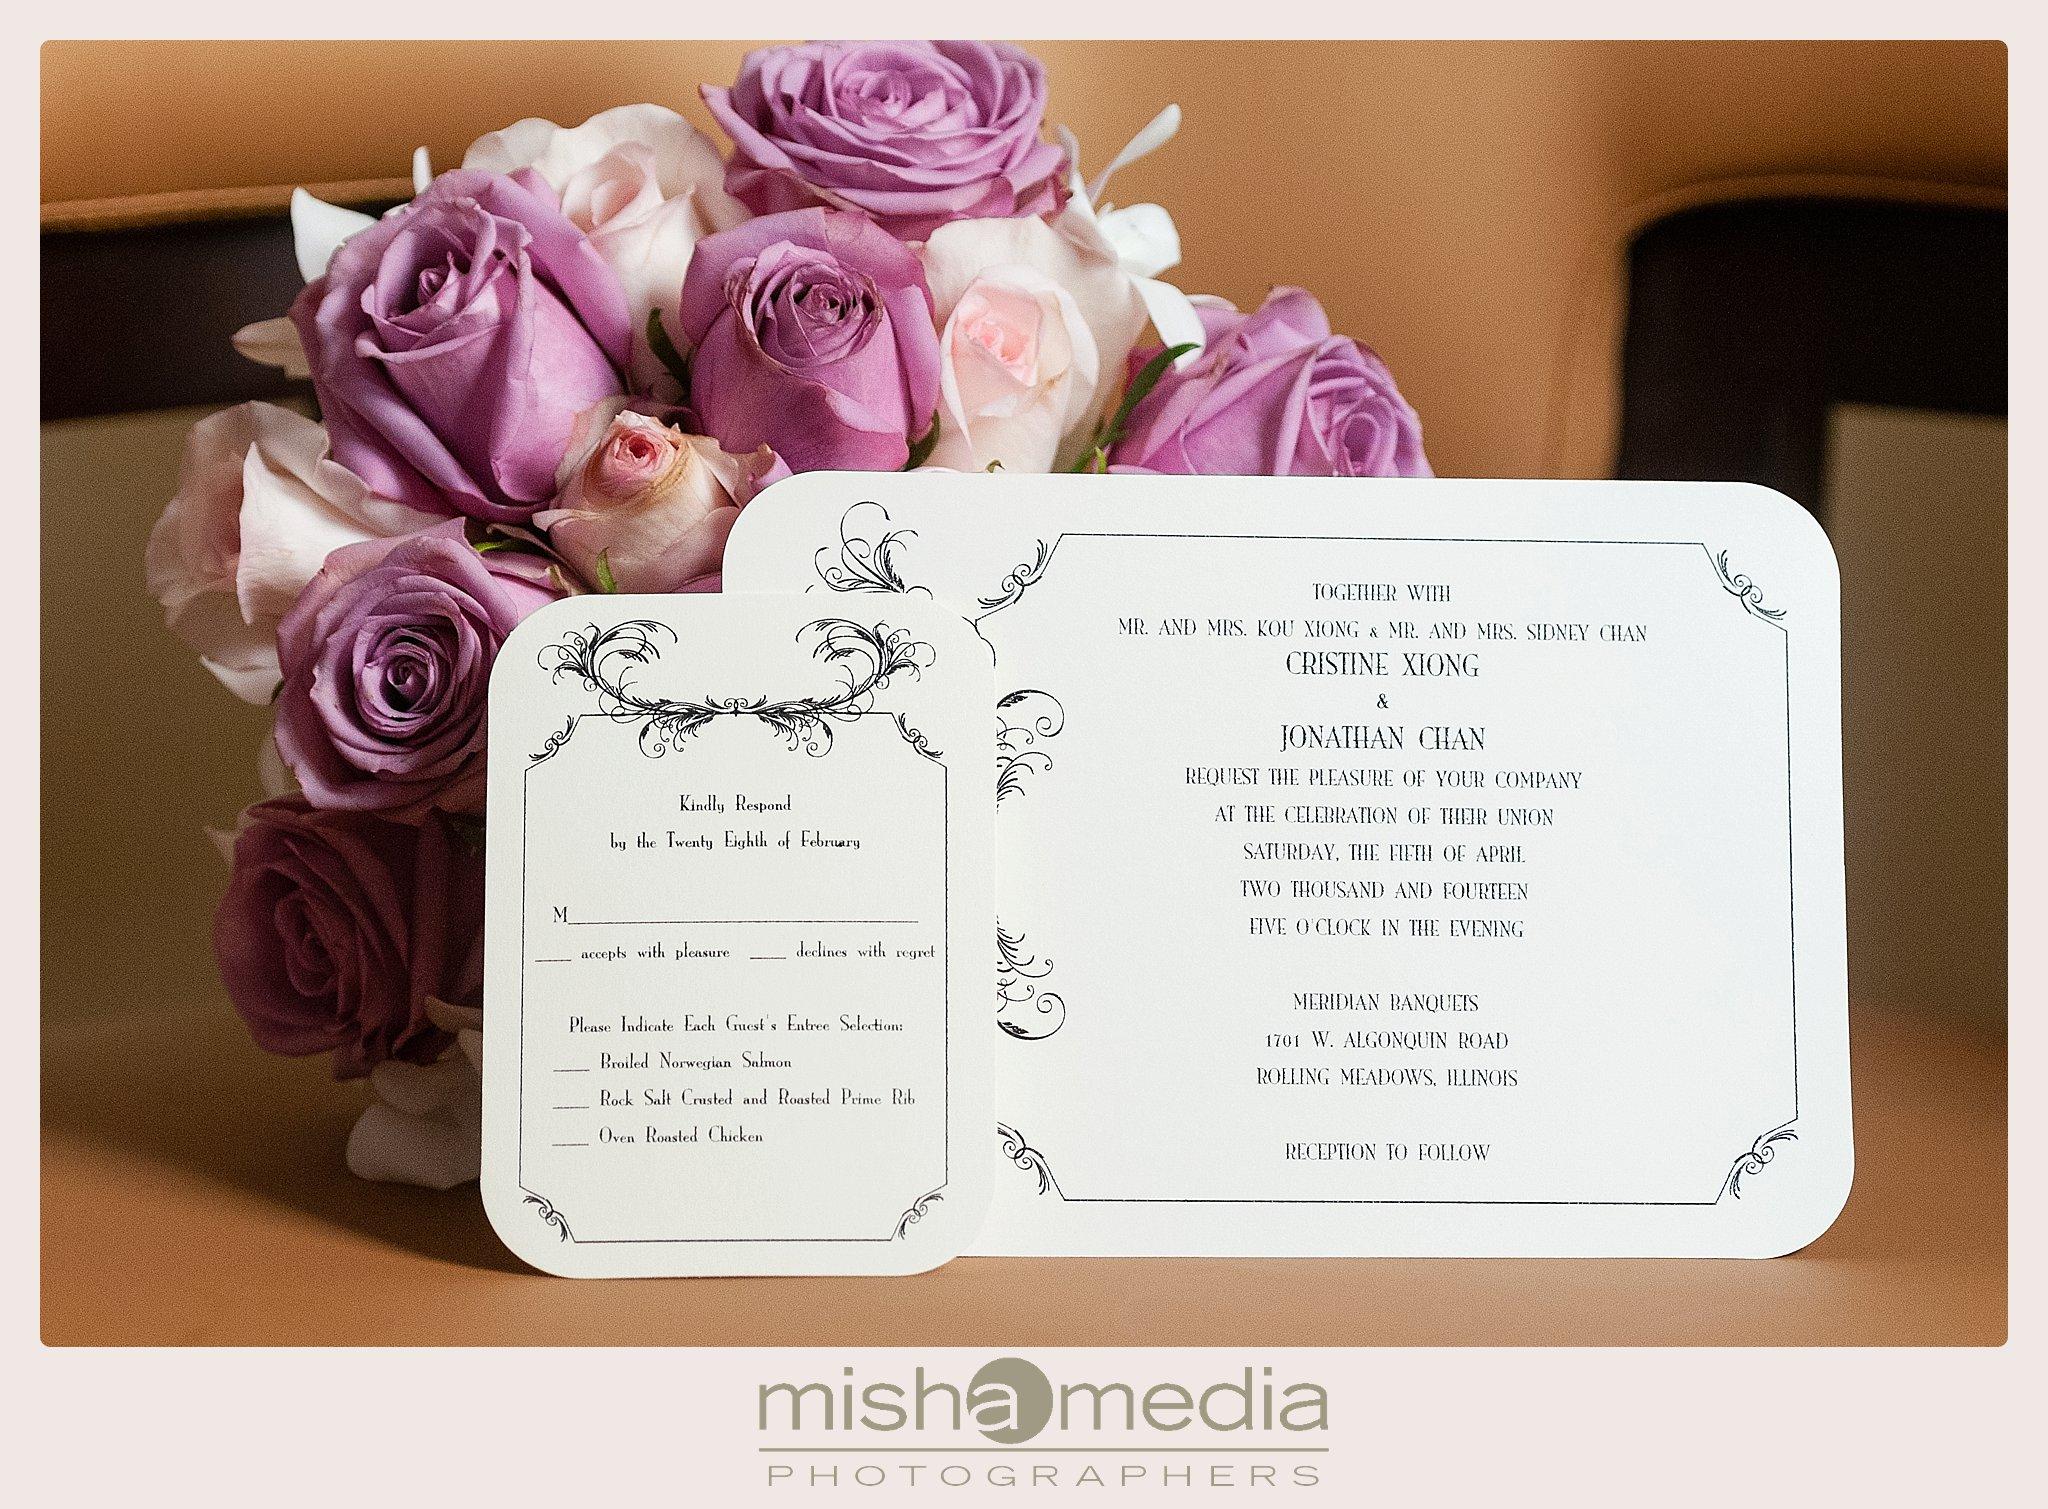 Meridian Banquets - CJ_0003